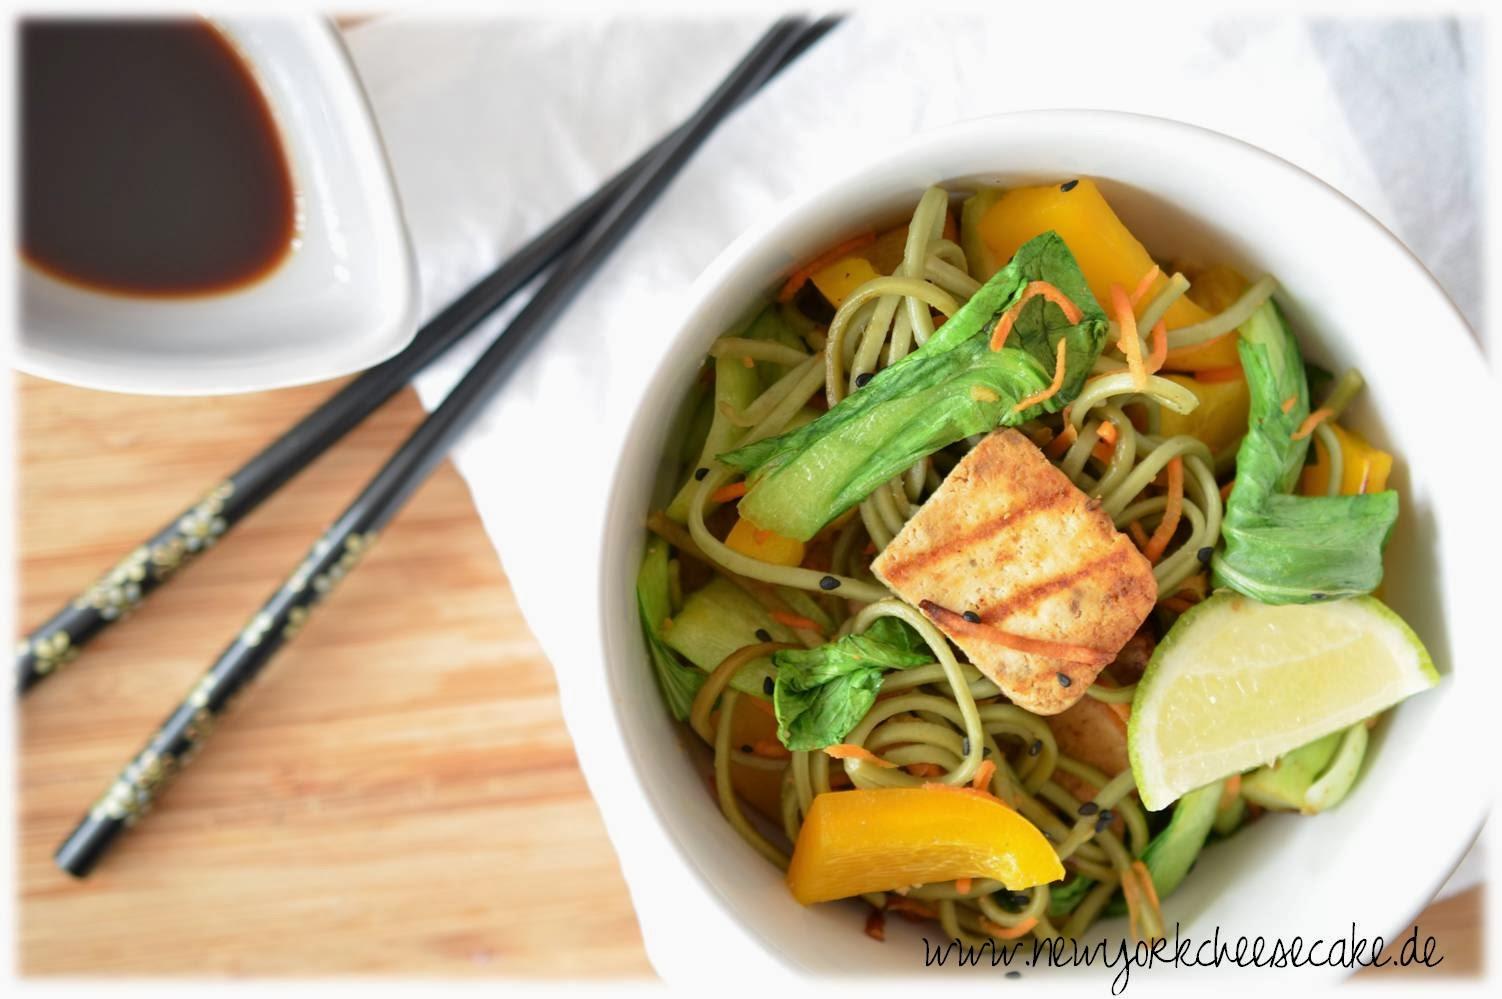 Asiatisch, vegan, tofu, soba